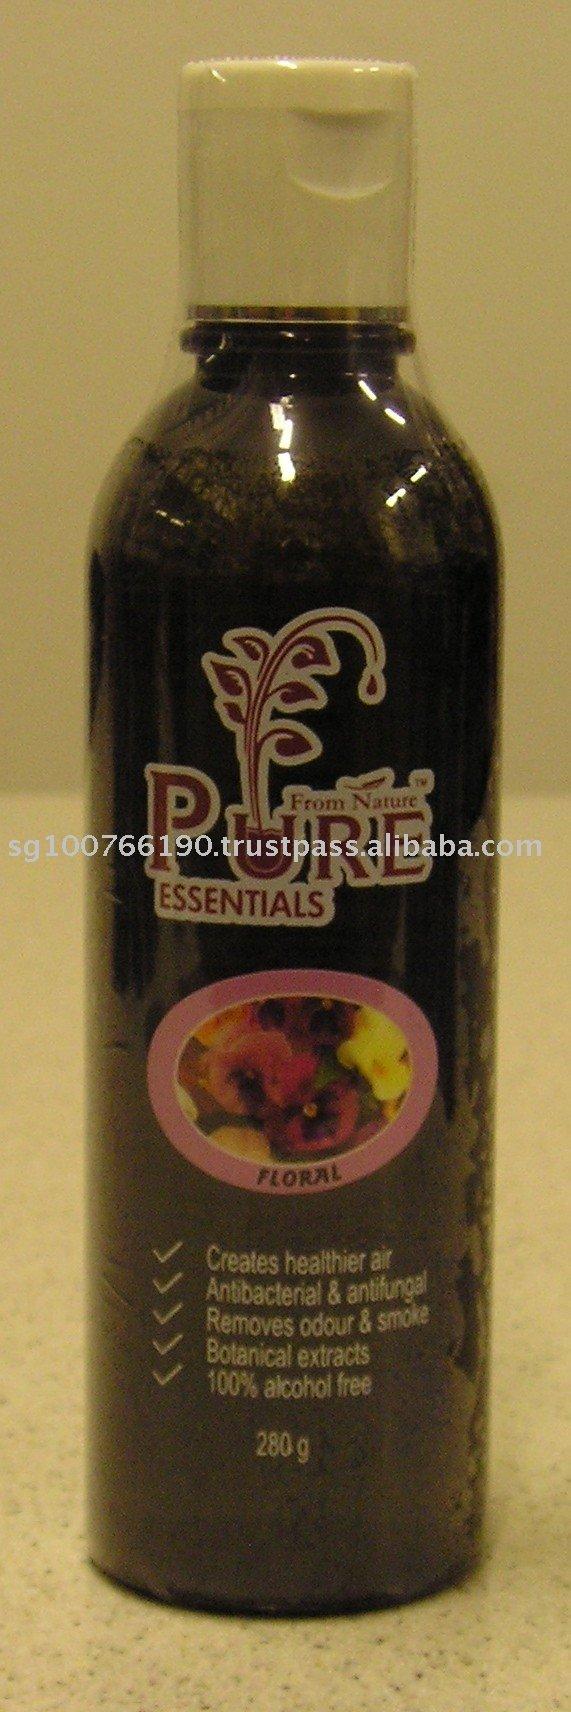 Puro aceite esencial ( fauna fragancia )